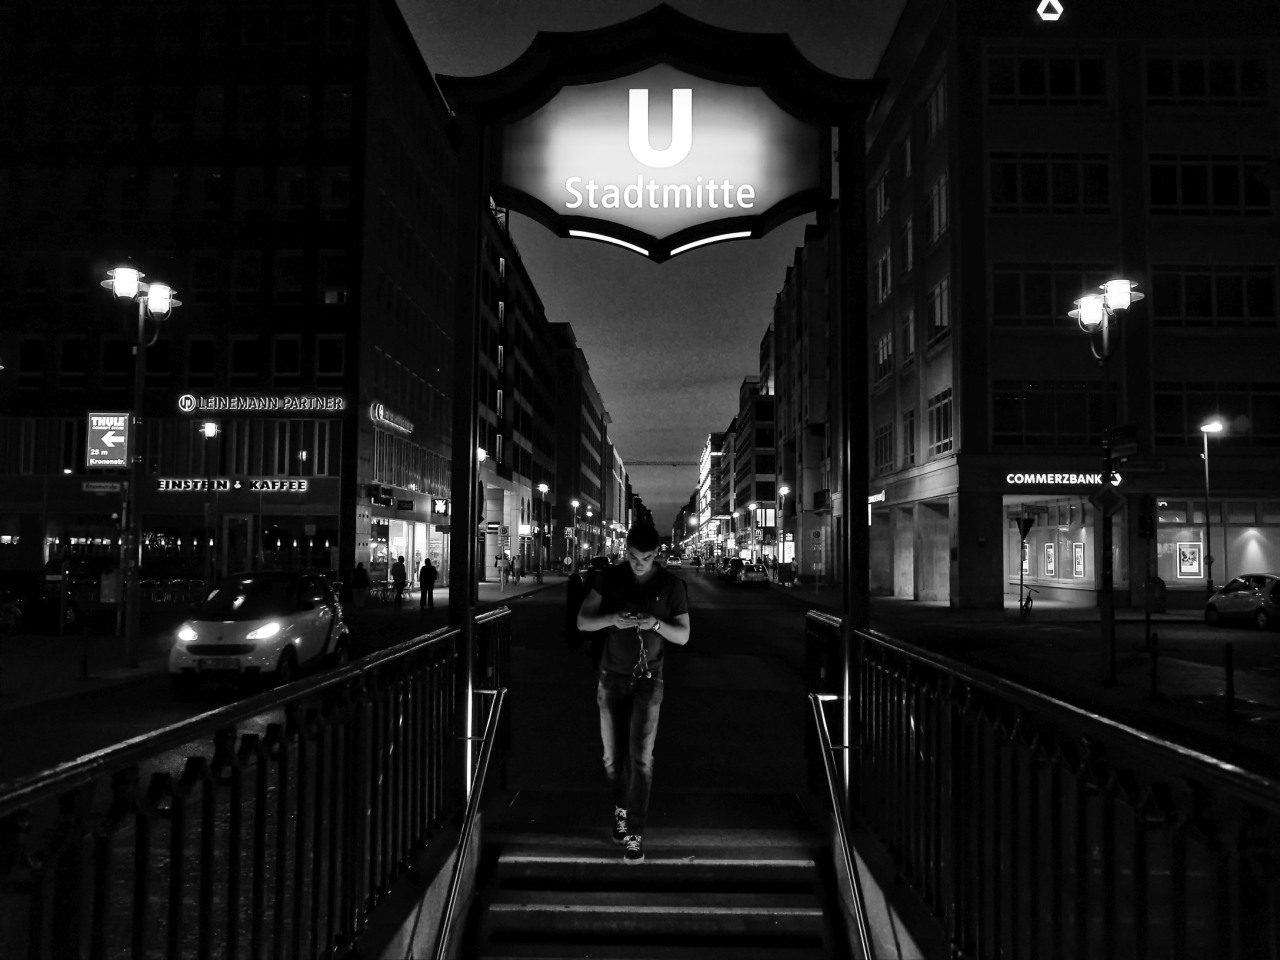 berlin 2013 #01|street photography|martin waltz